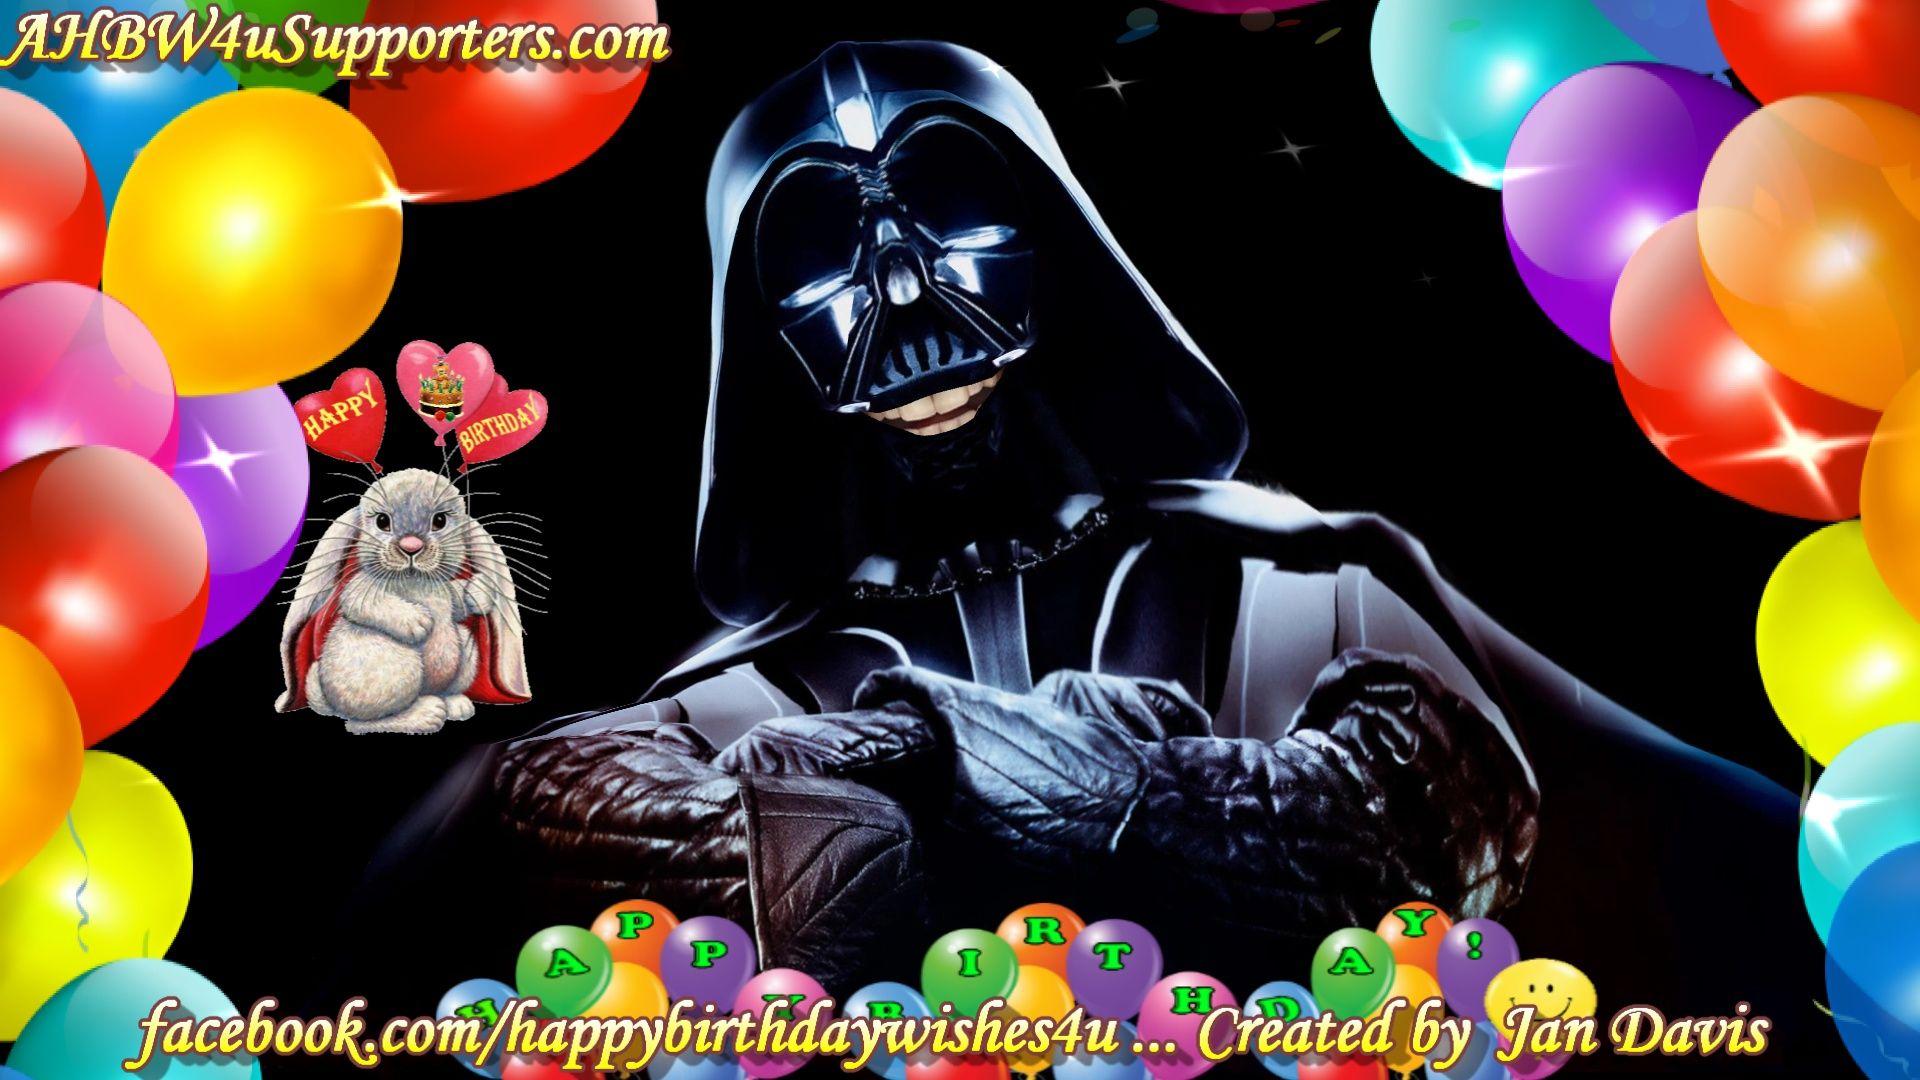 Star Wars Darth Vader sings Happy Birthday 2U